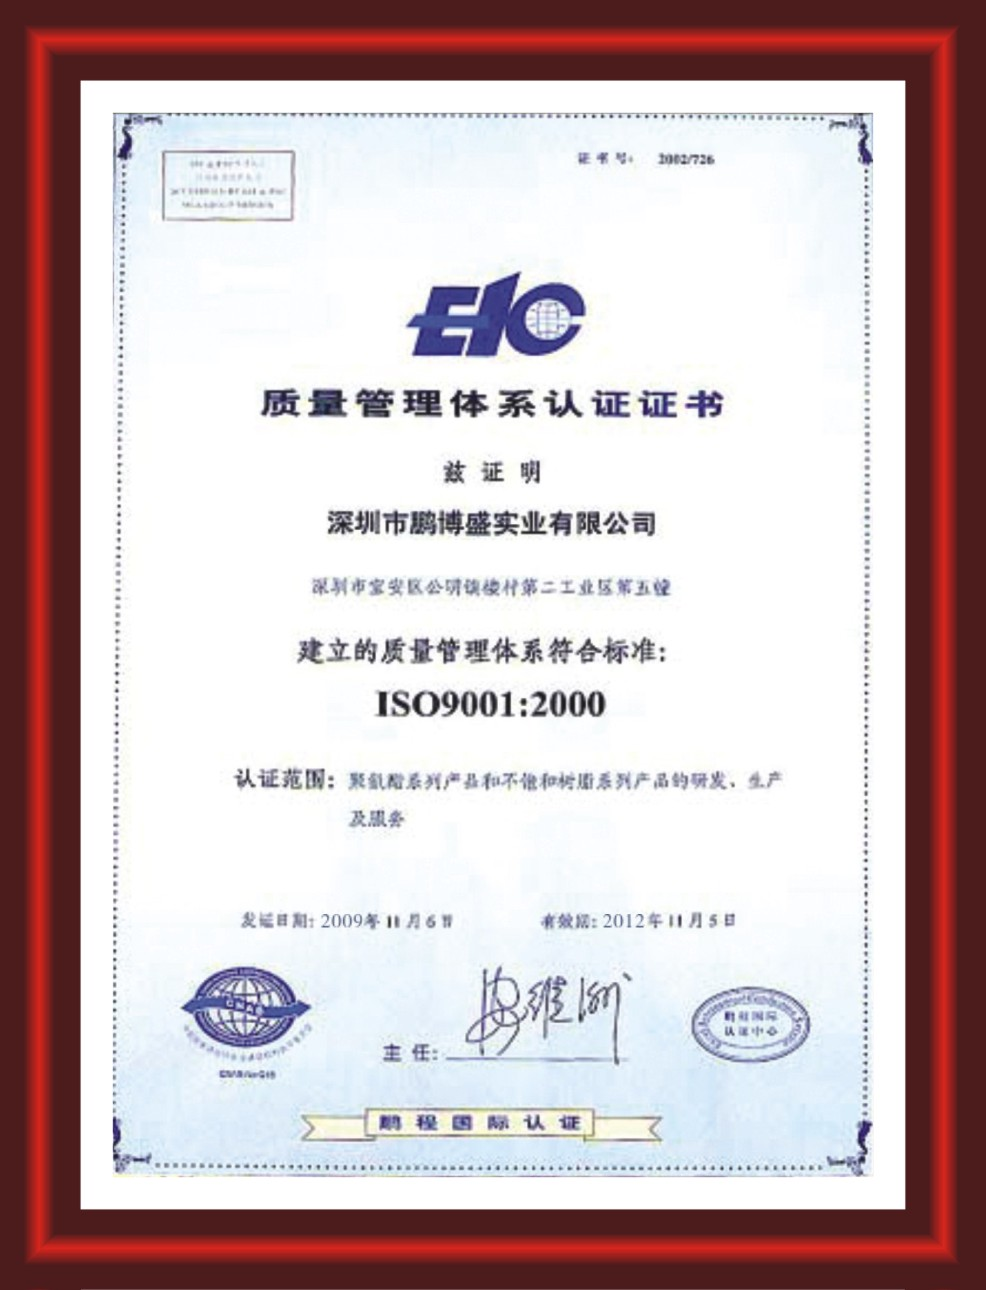 Shenzhen Pepson ISO Certificate(chinese)